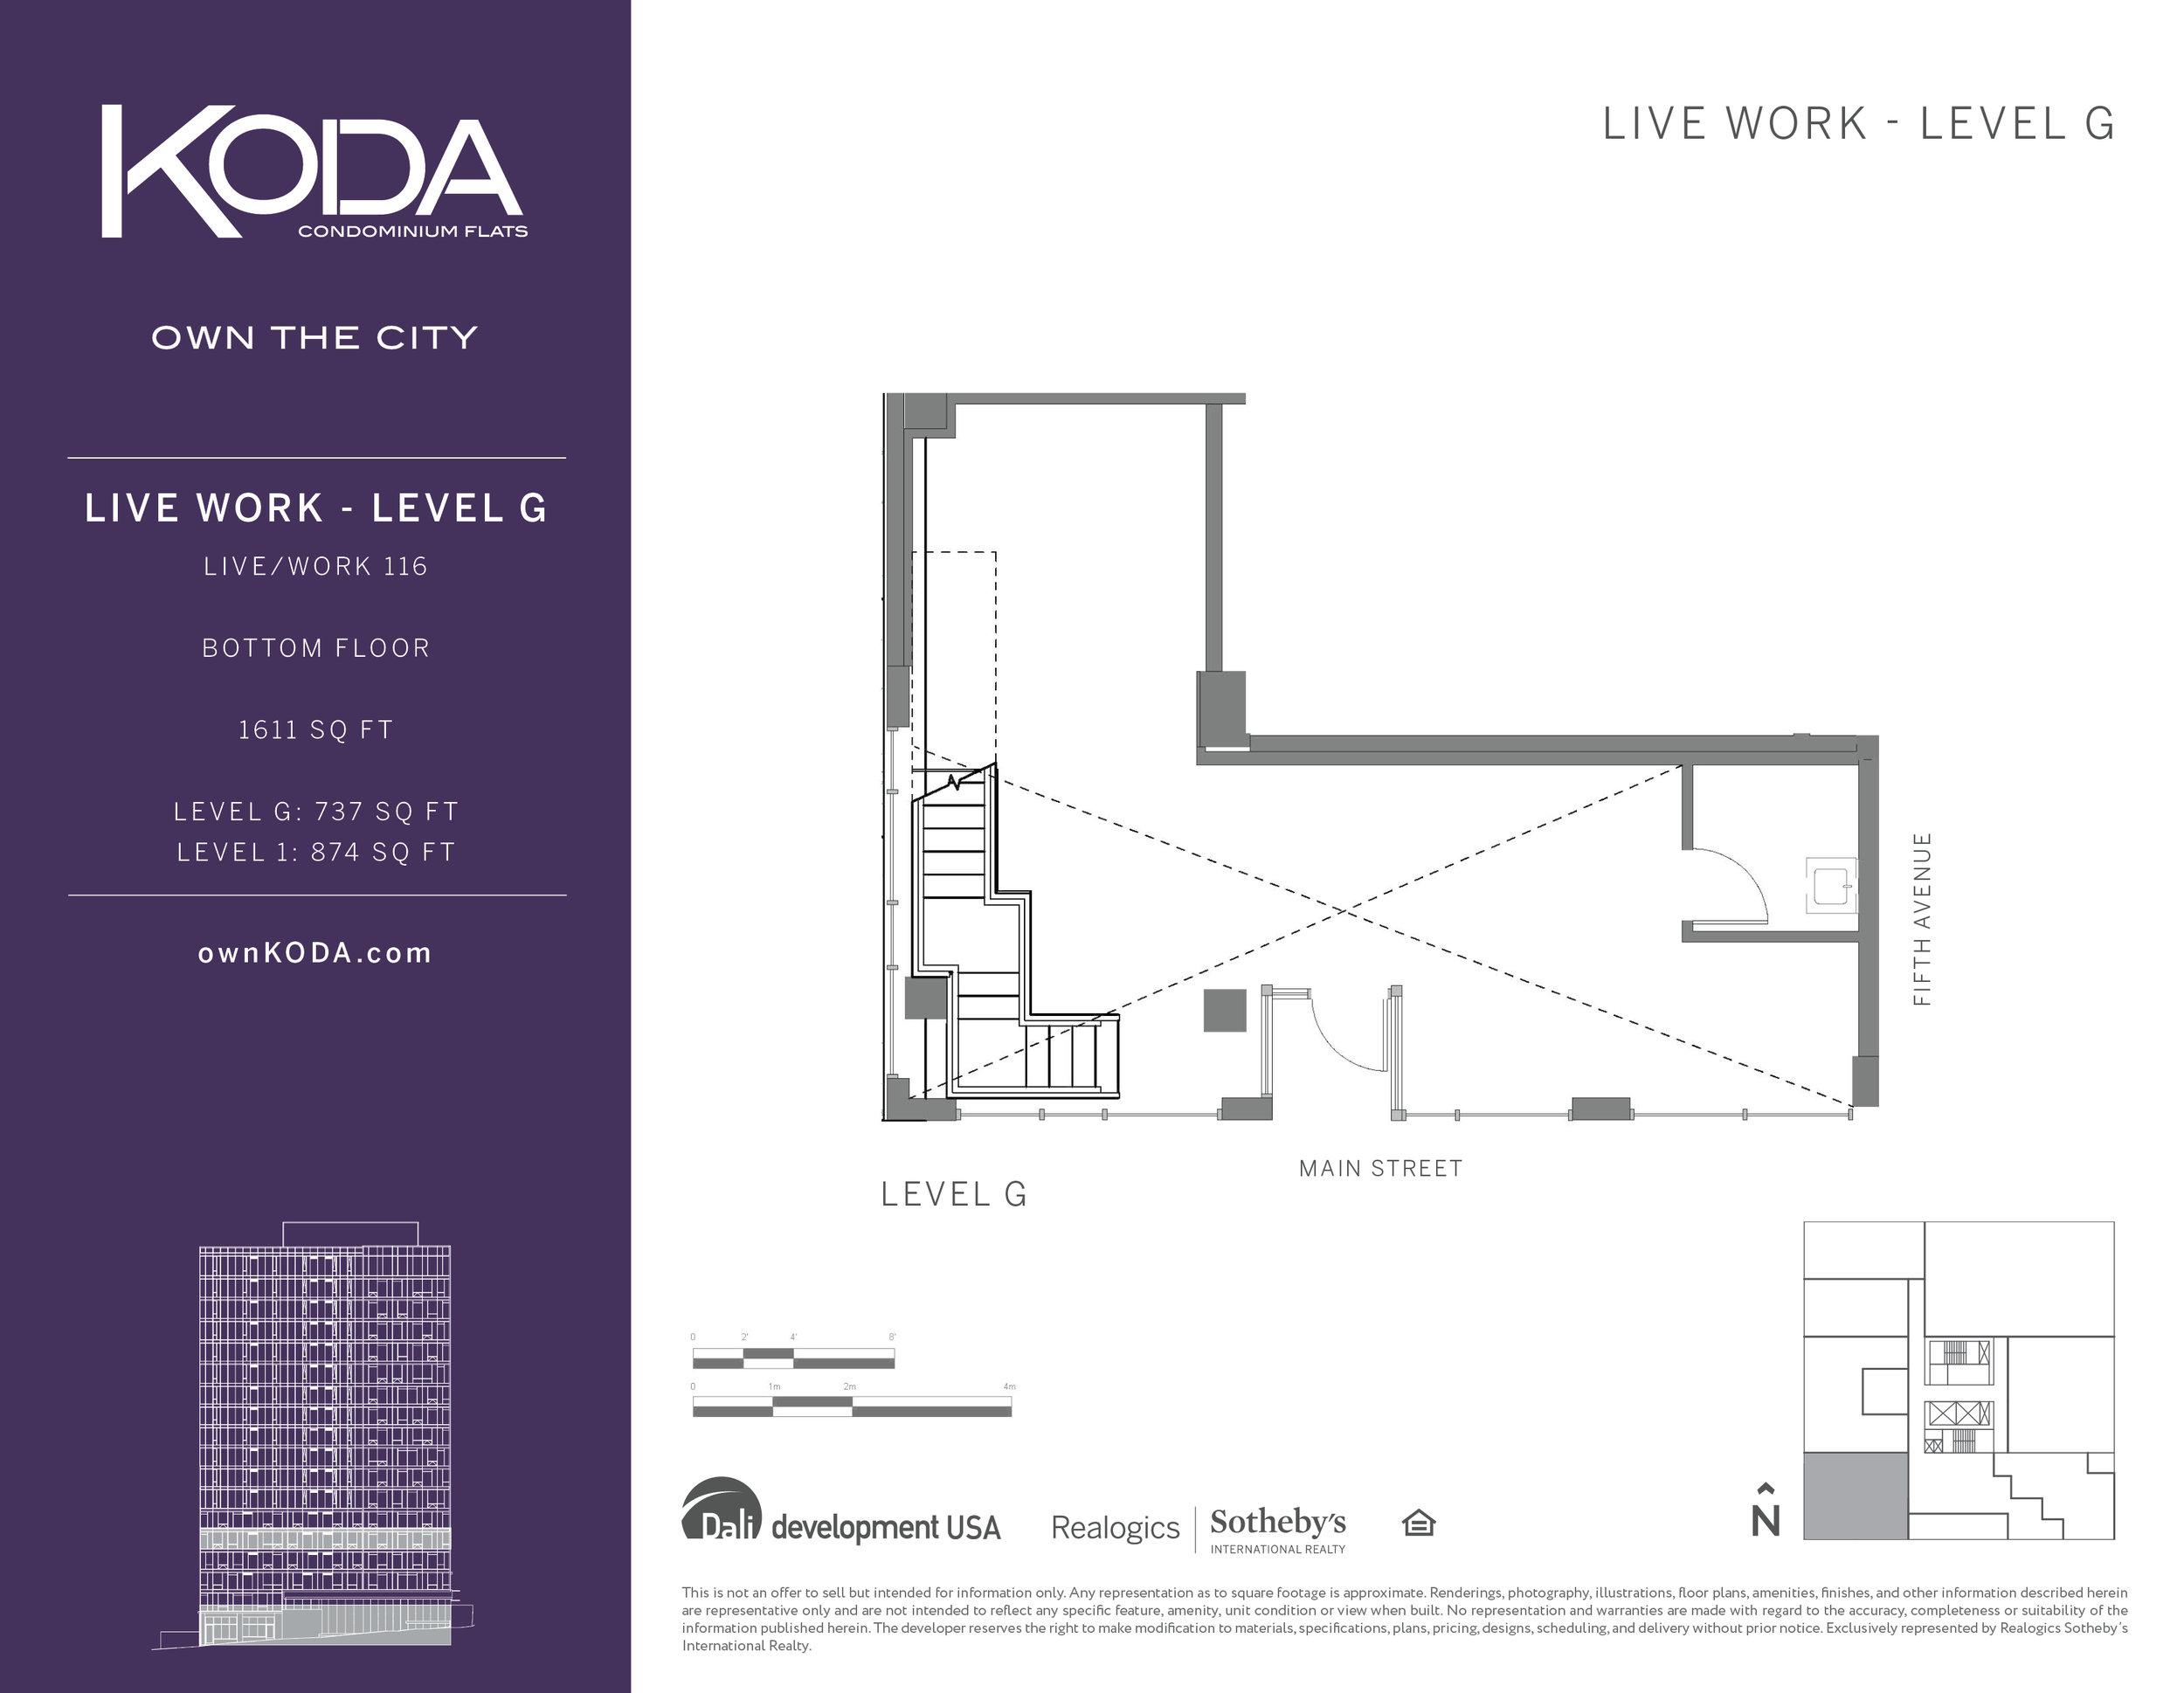 KODA_FloorPlanFlyer_Update_Approved_04.04.19_Release37.jpg